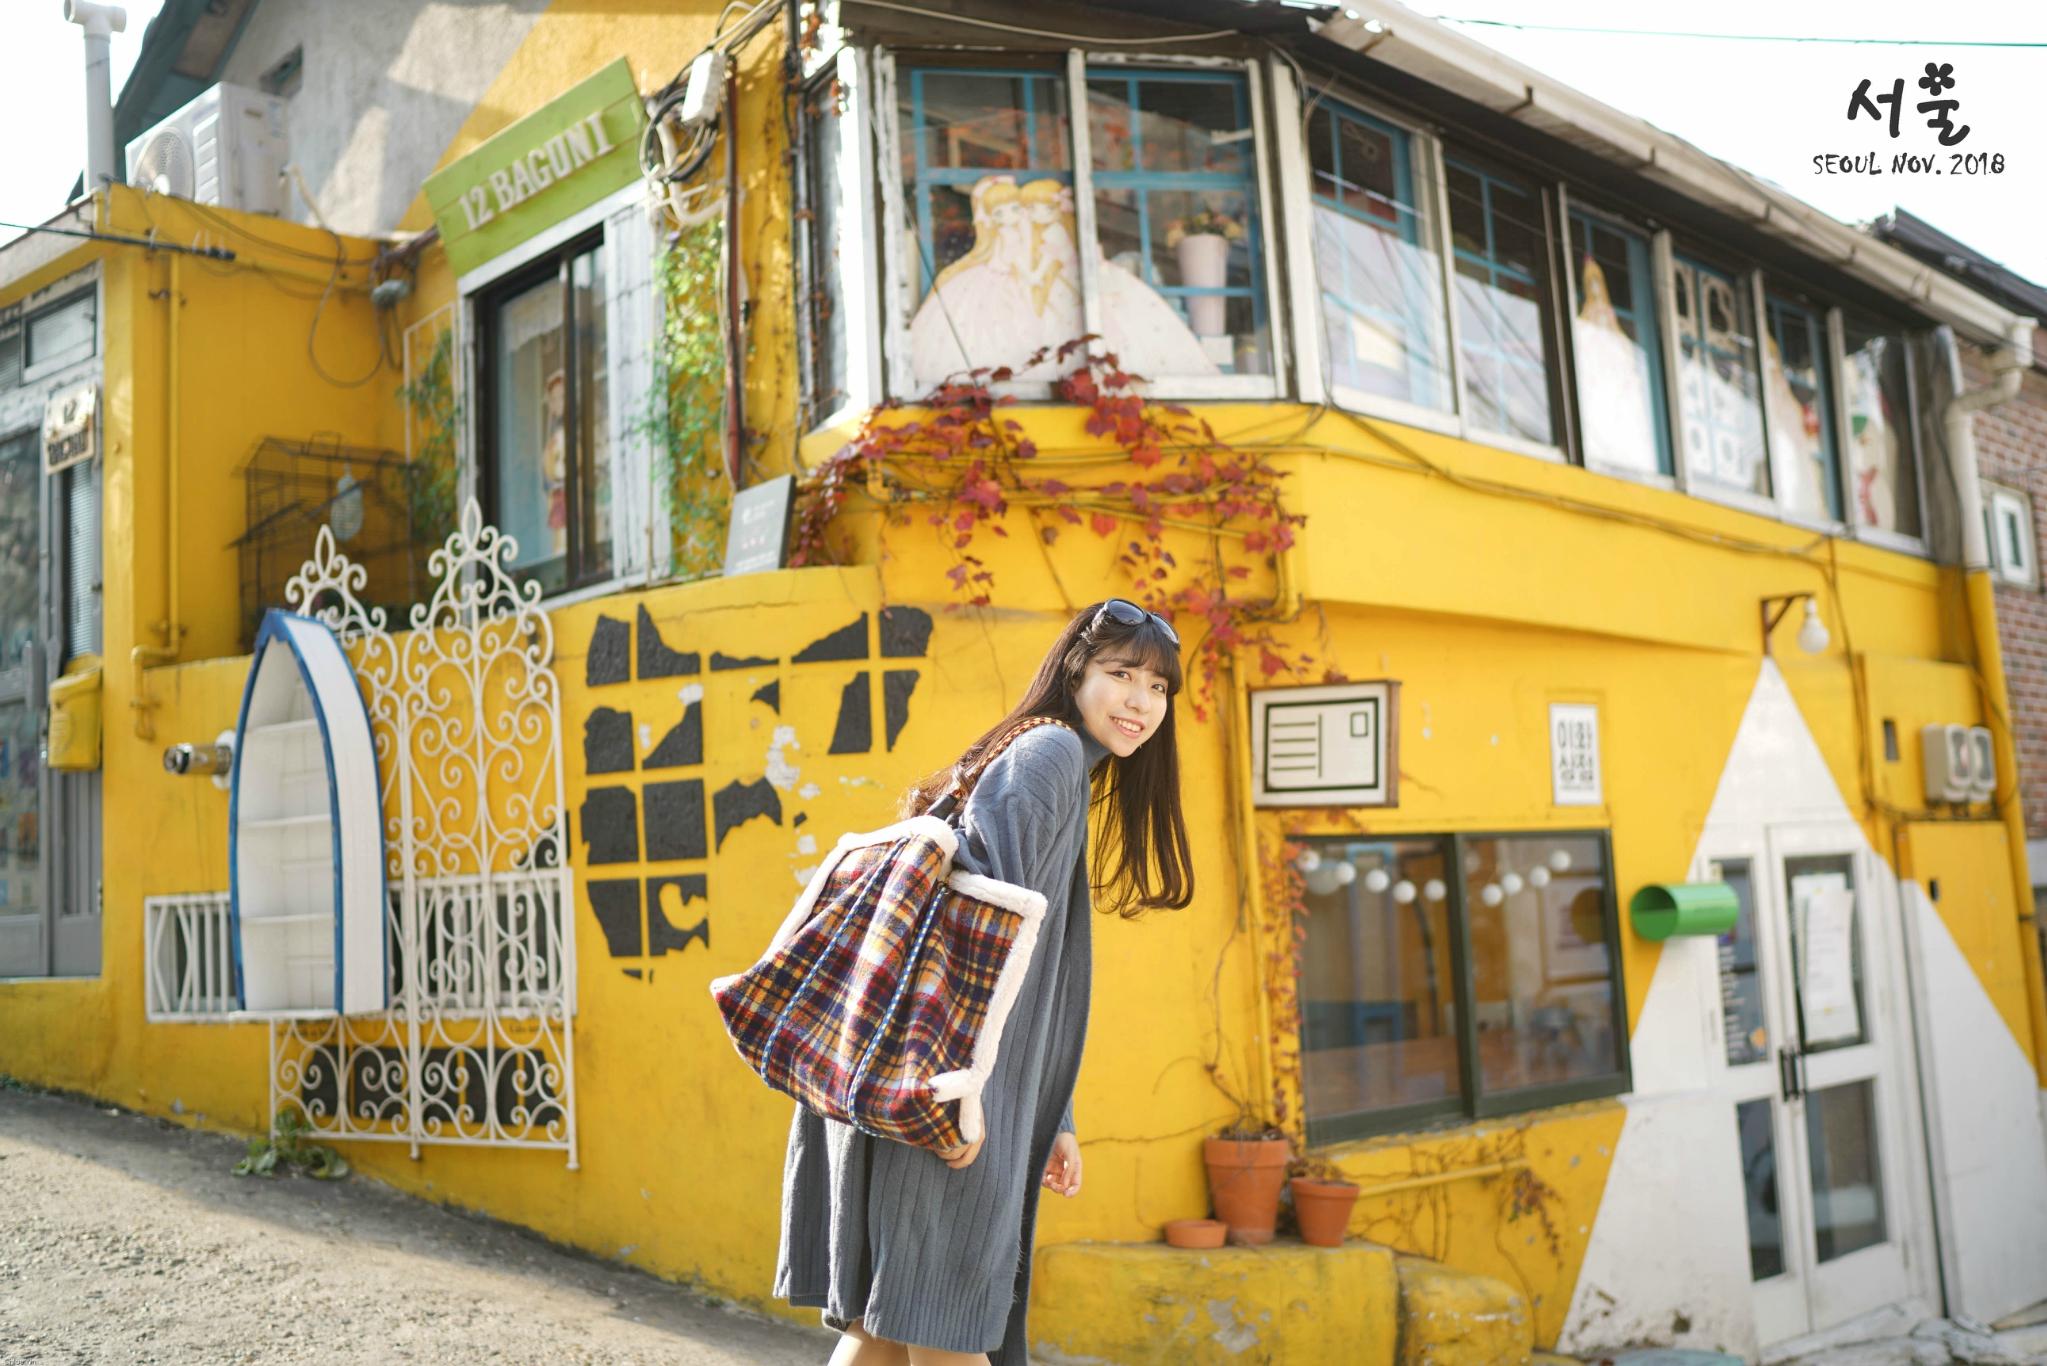 SEOUL!以韩剧为名,邂逅曾经的少女心时代(首尔小众旅行&网红地探店)